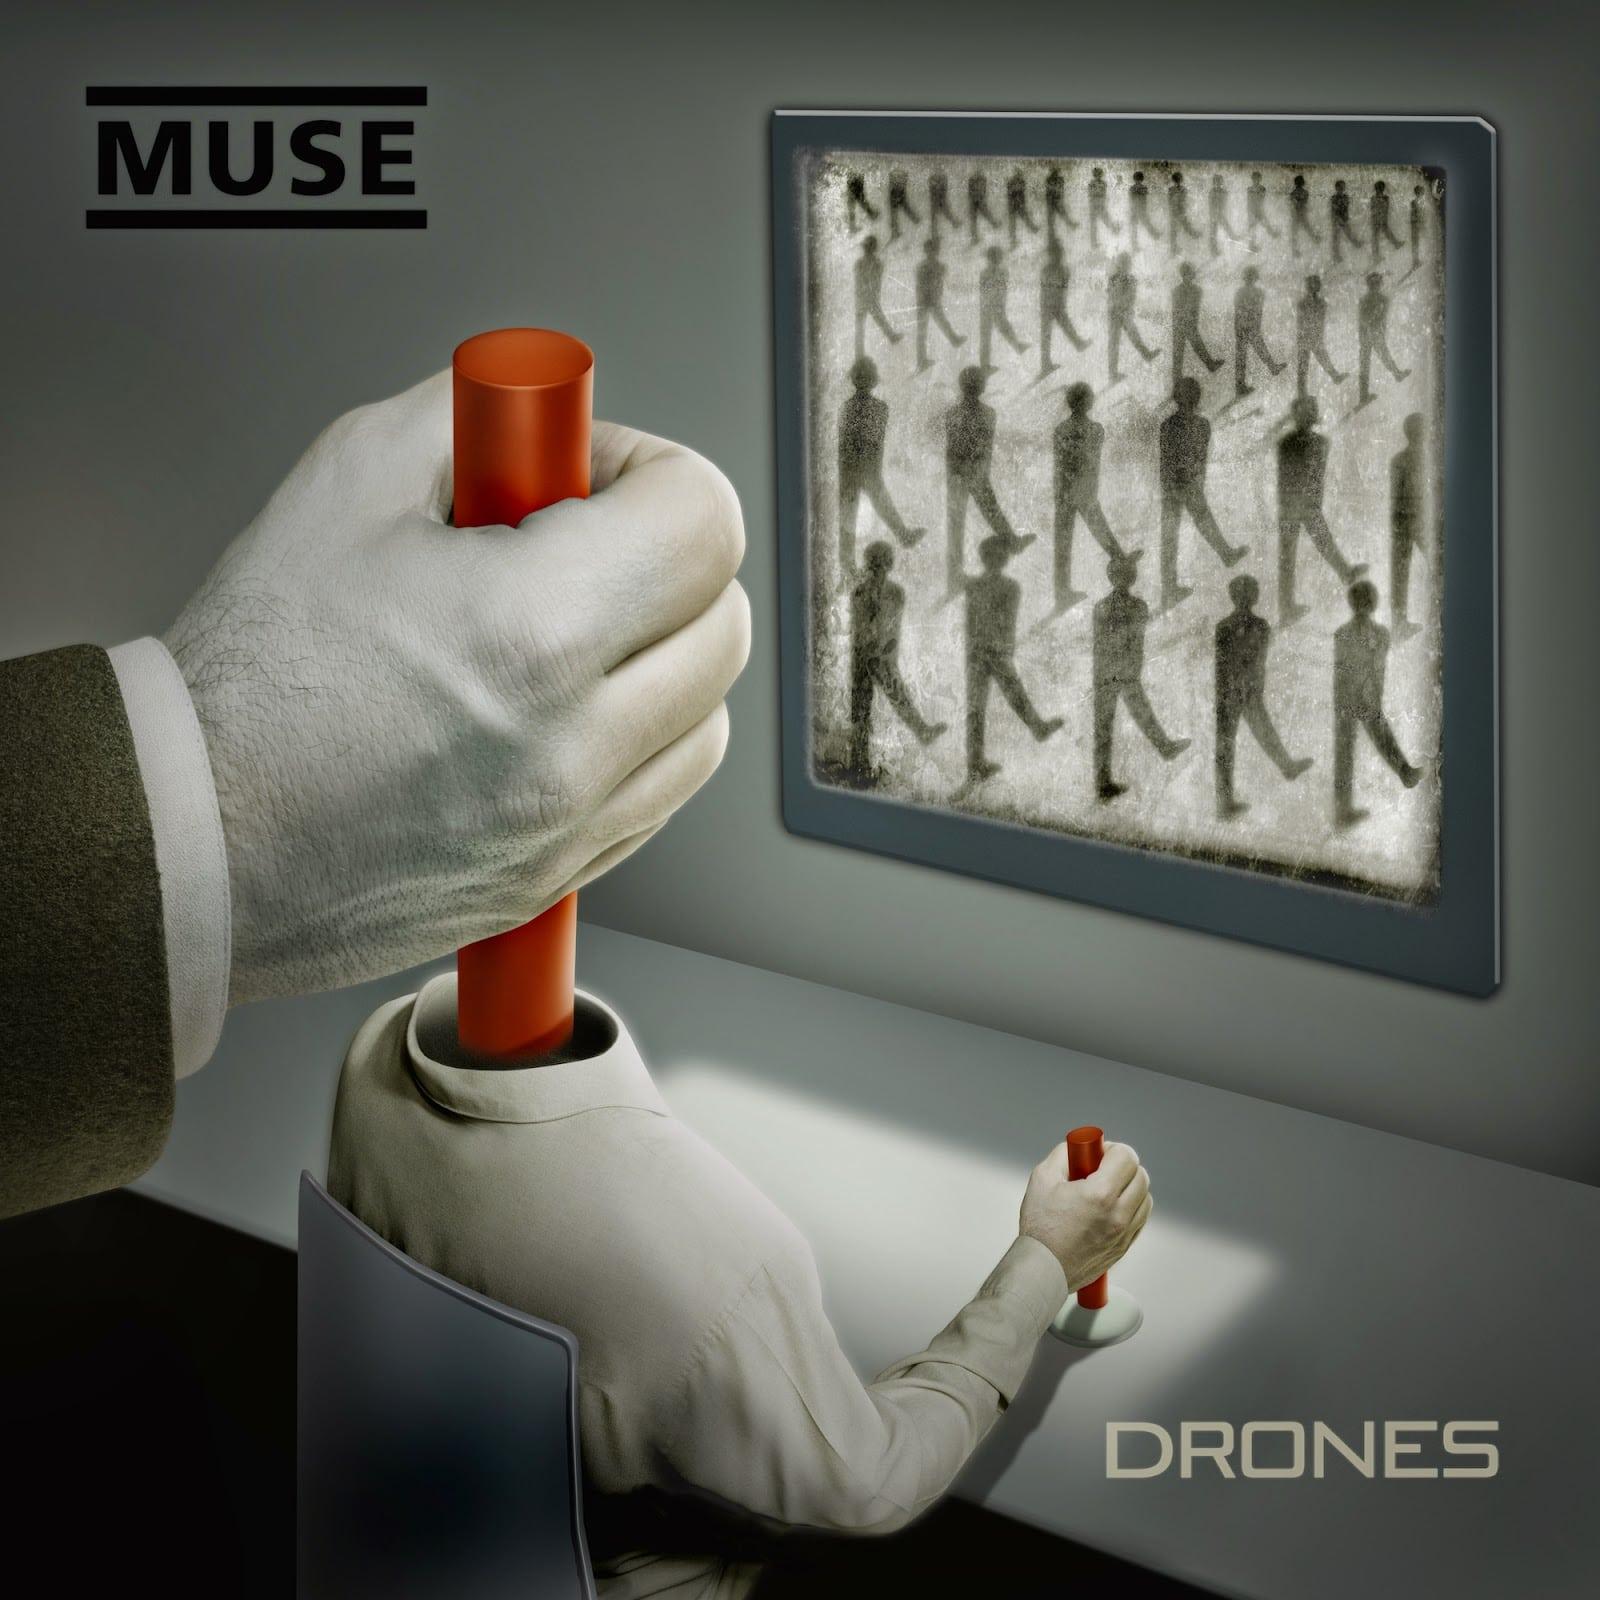 muse_drones